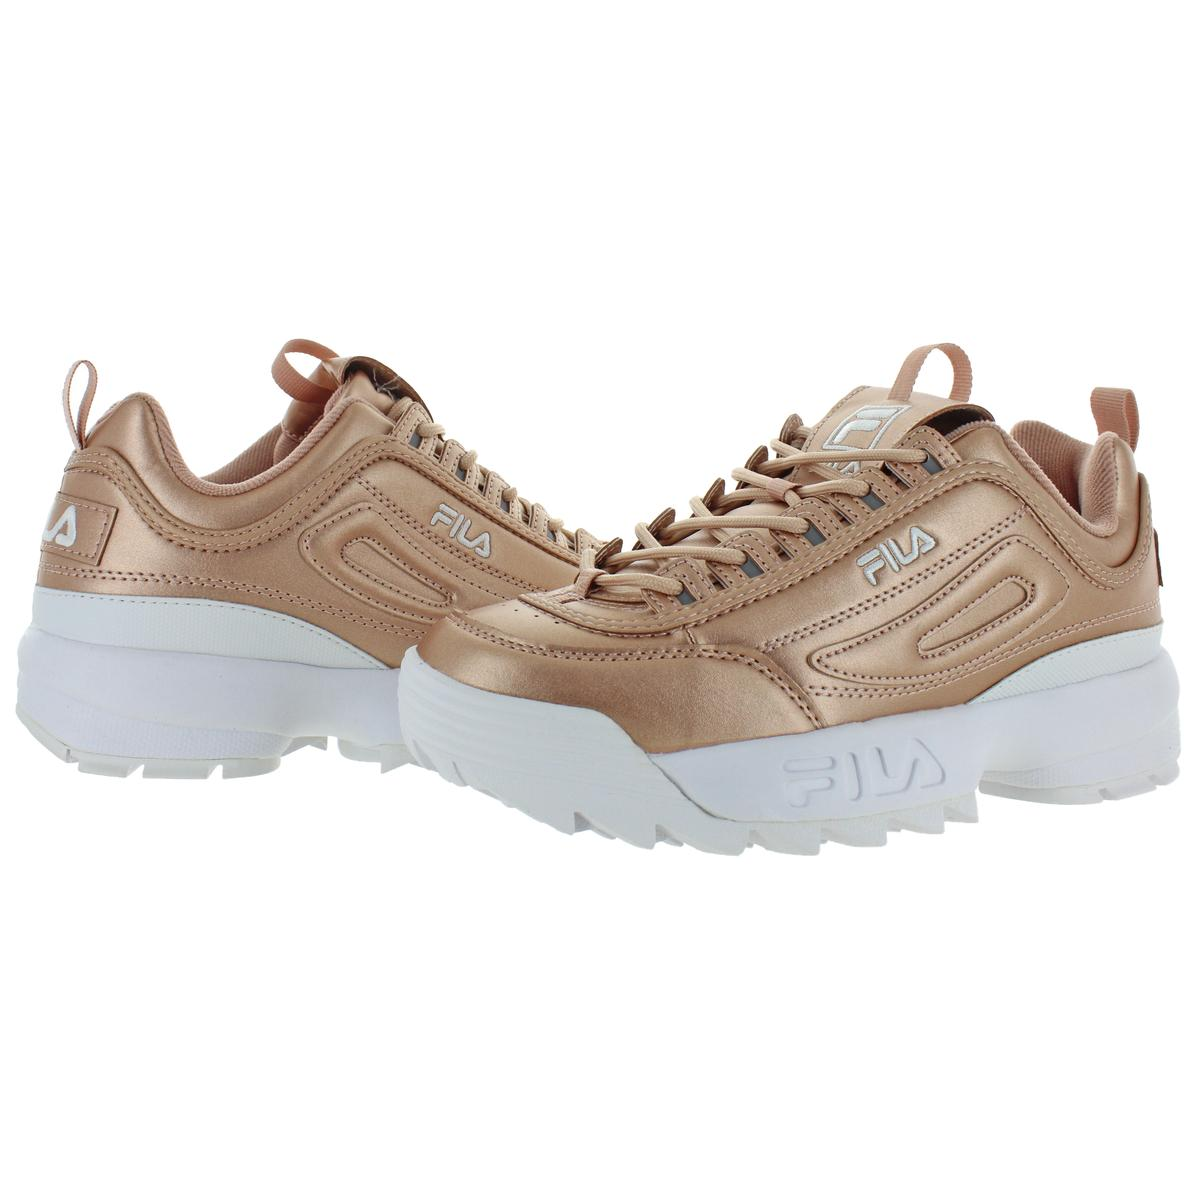 Fila-Womens-Disruptor-II-Premium-Metallic-Trainers-Sneakers-Shoes-BHFO-5237 thumbnail 10